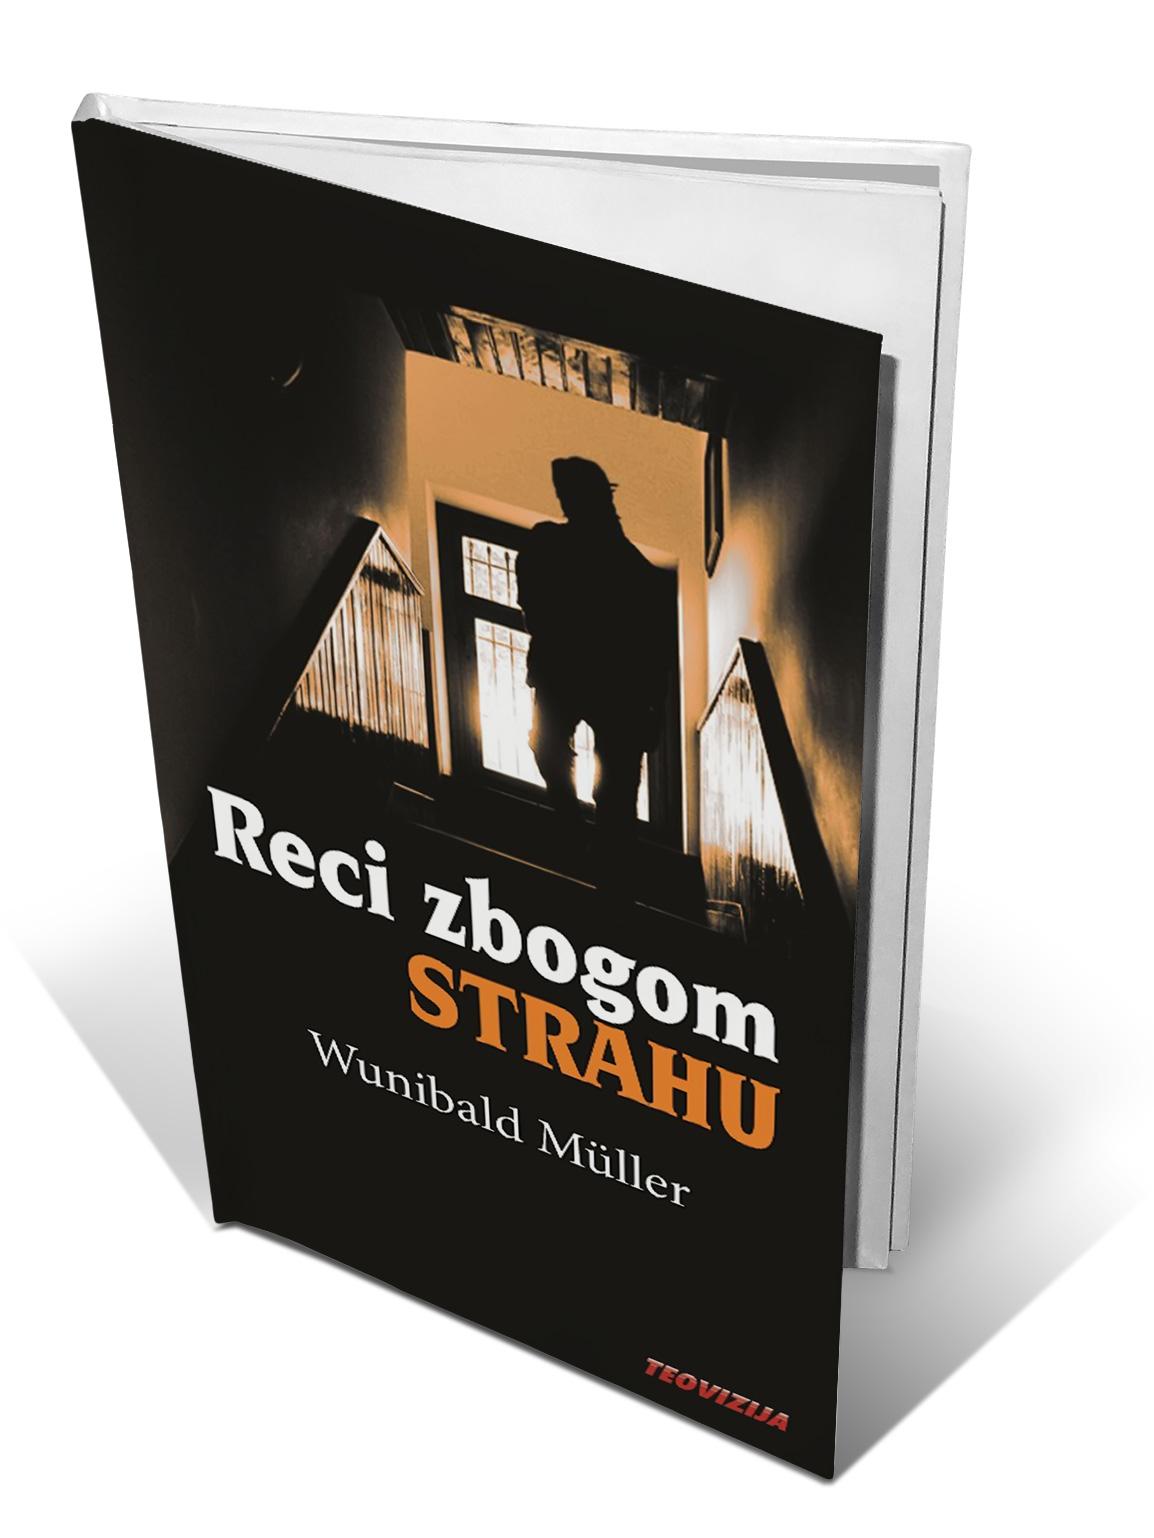 RECI ZBOGOM STRAHU - Wunibald Mueller